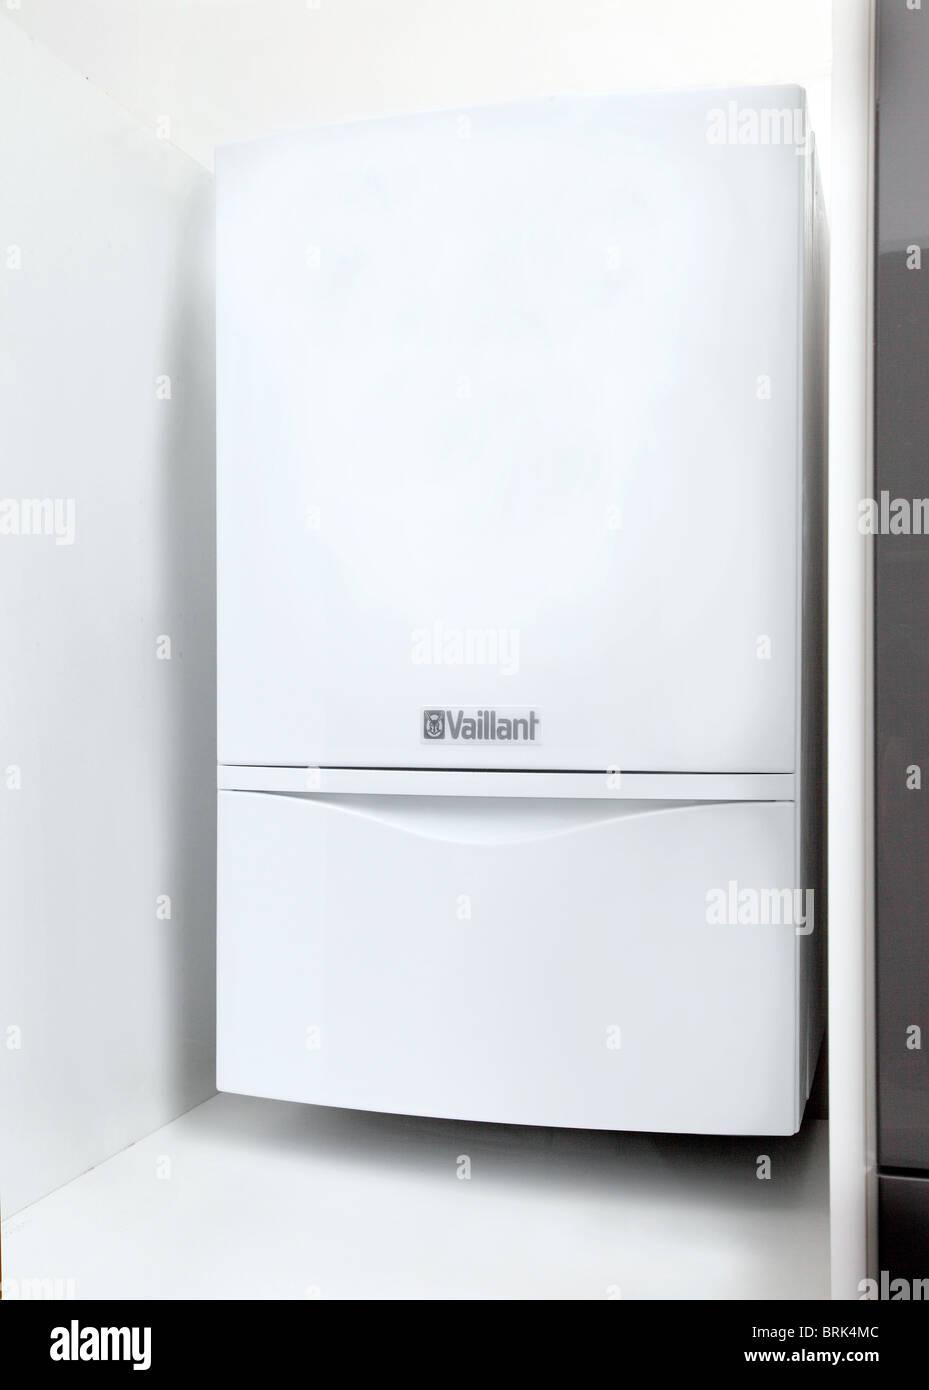 Vailant Ecotech plus 637 household boiler Stock Photo: 31768252 - Alamy